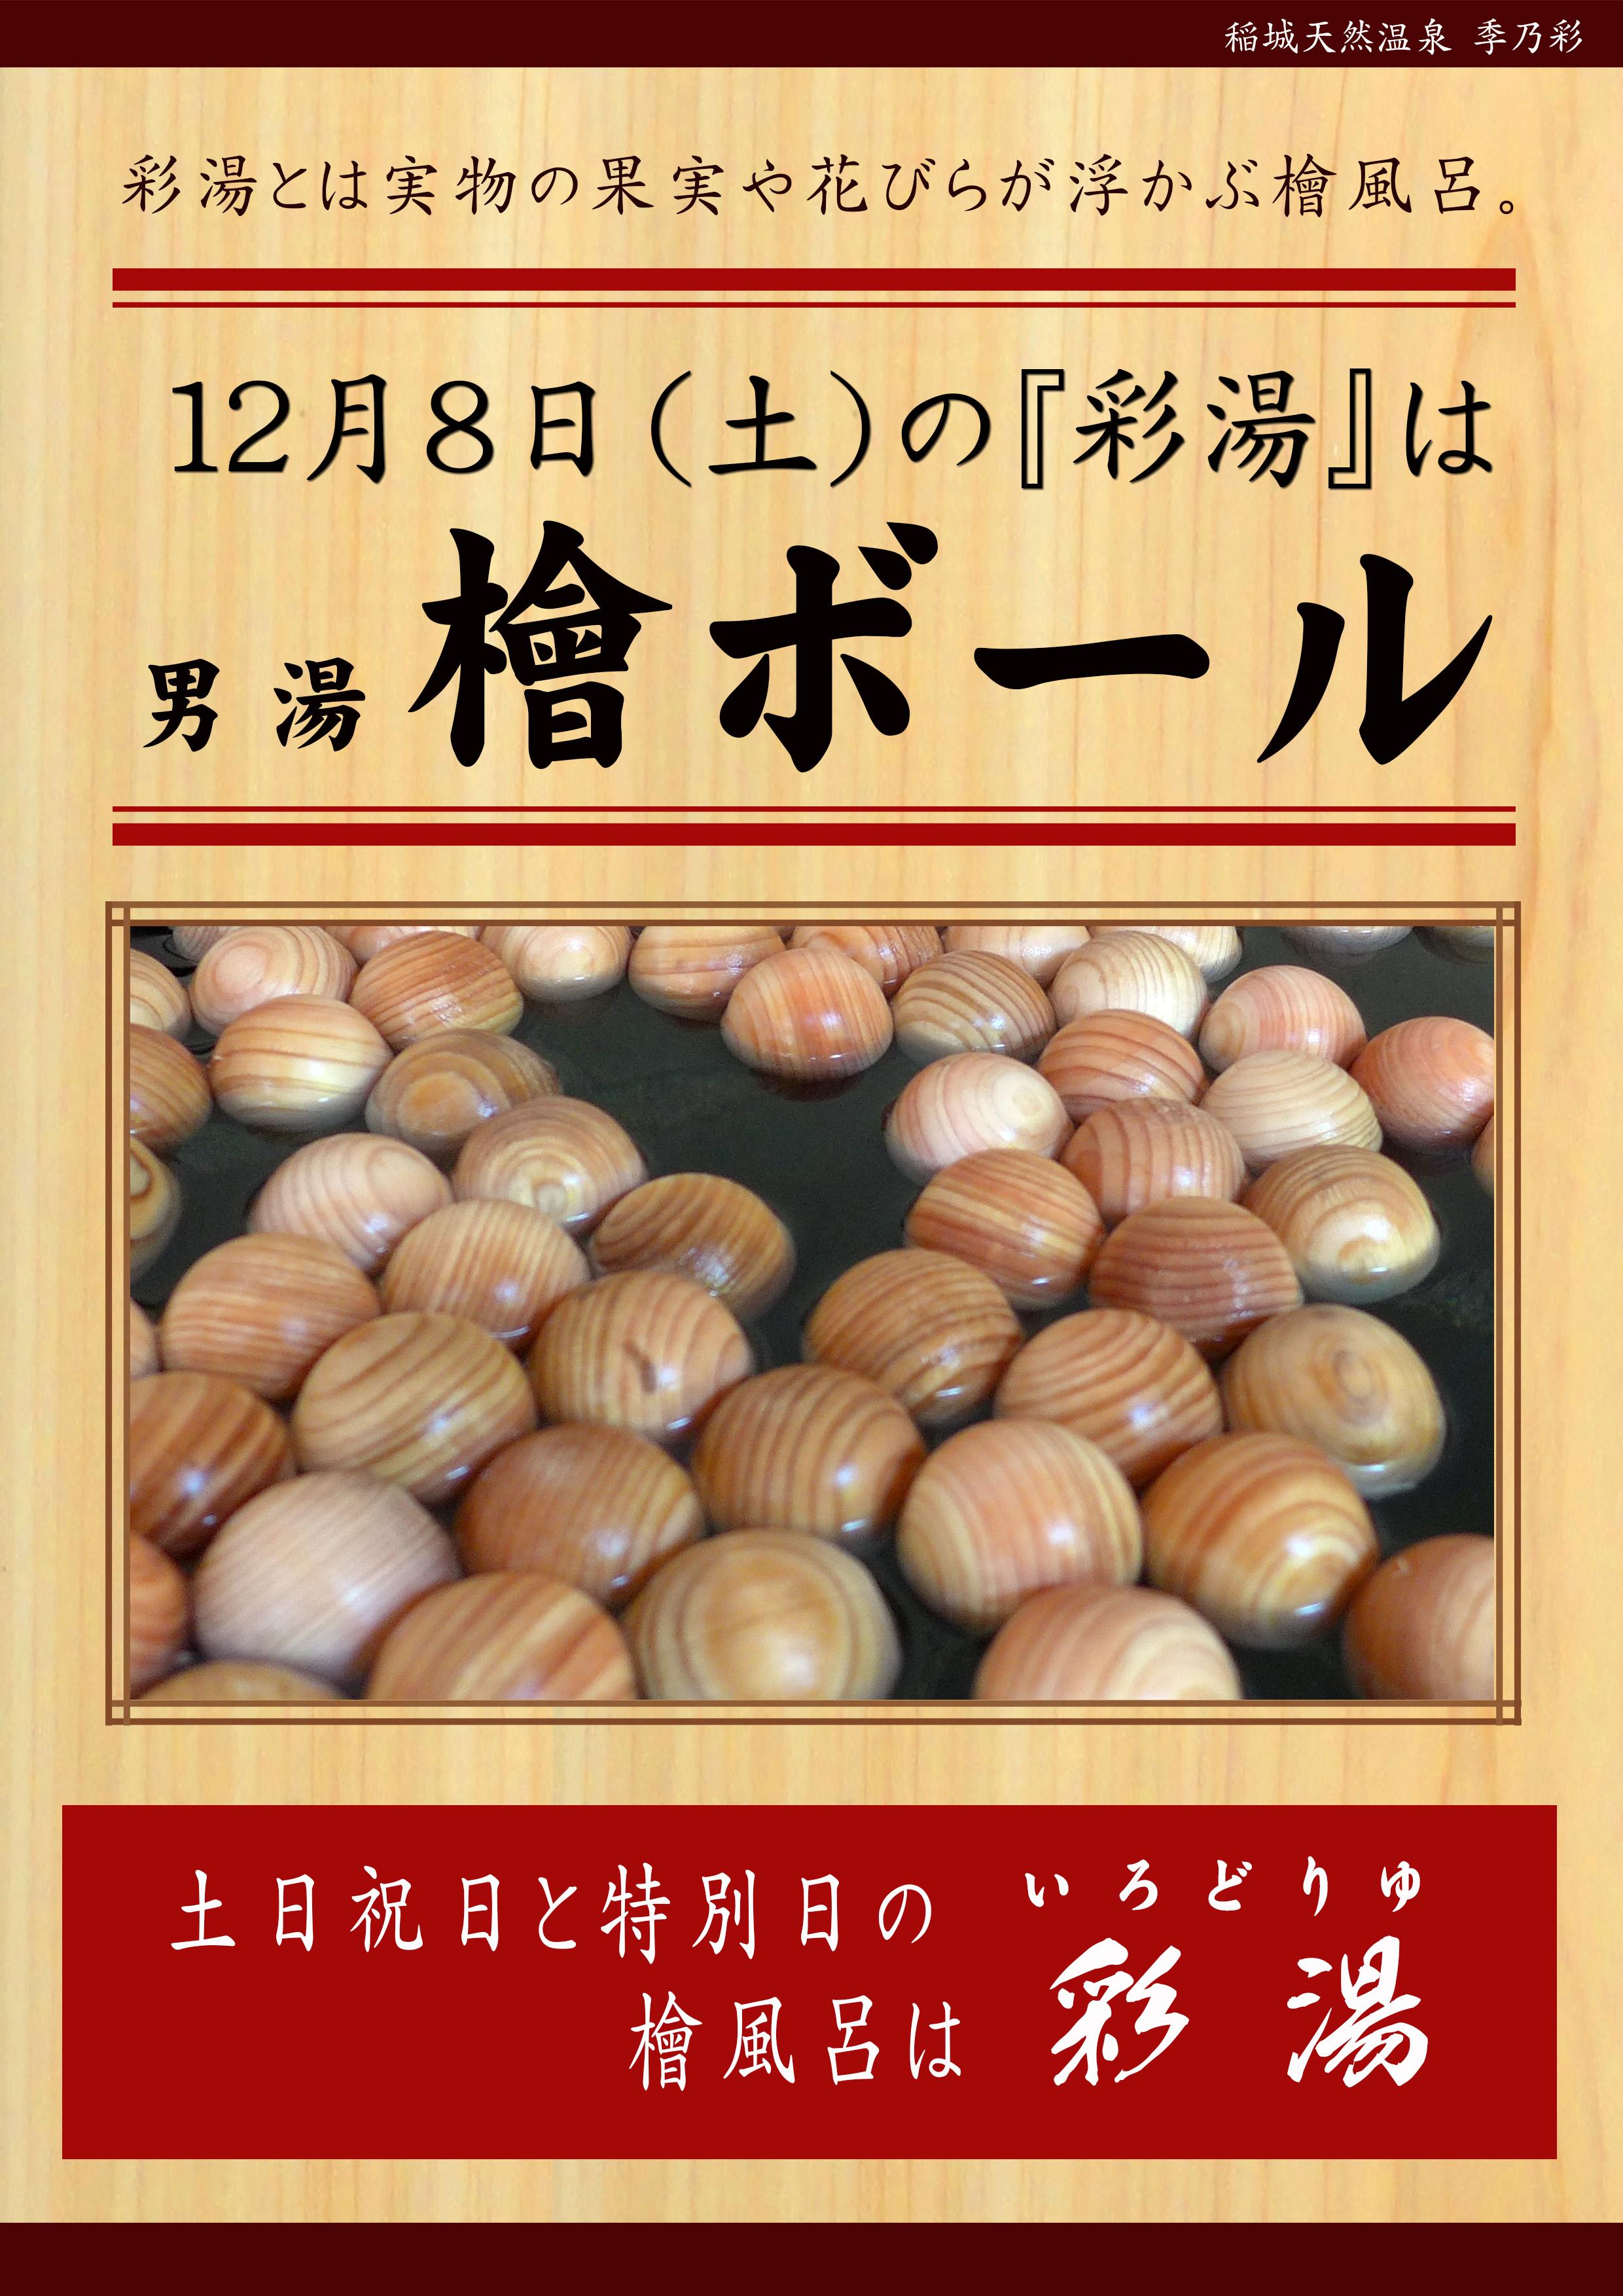 20181208POP イベント 彩湯 男湯 檜ボール